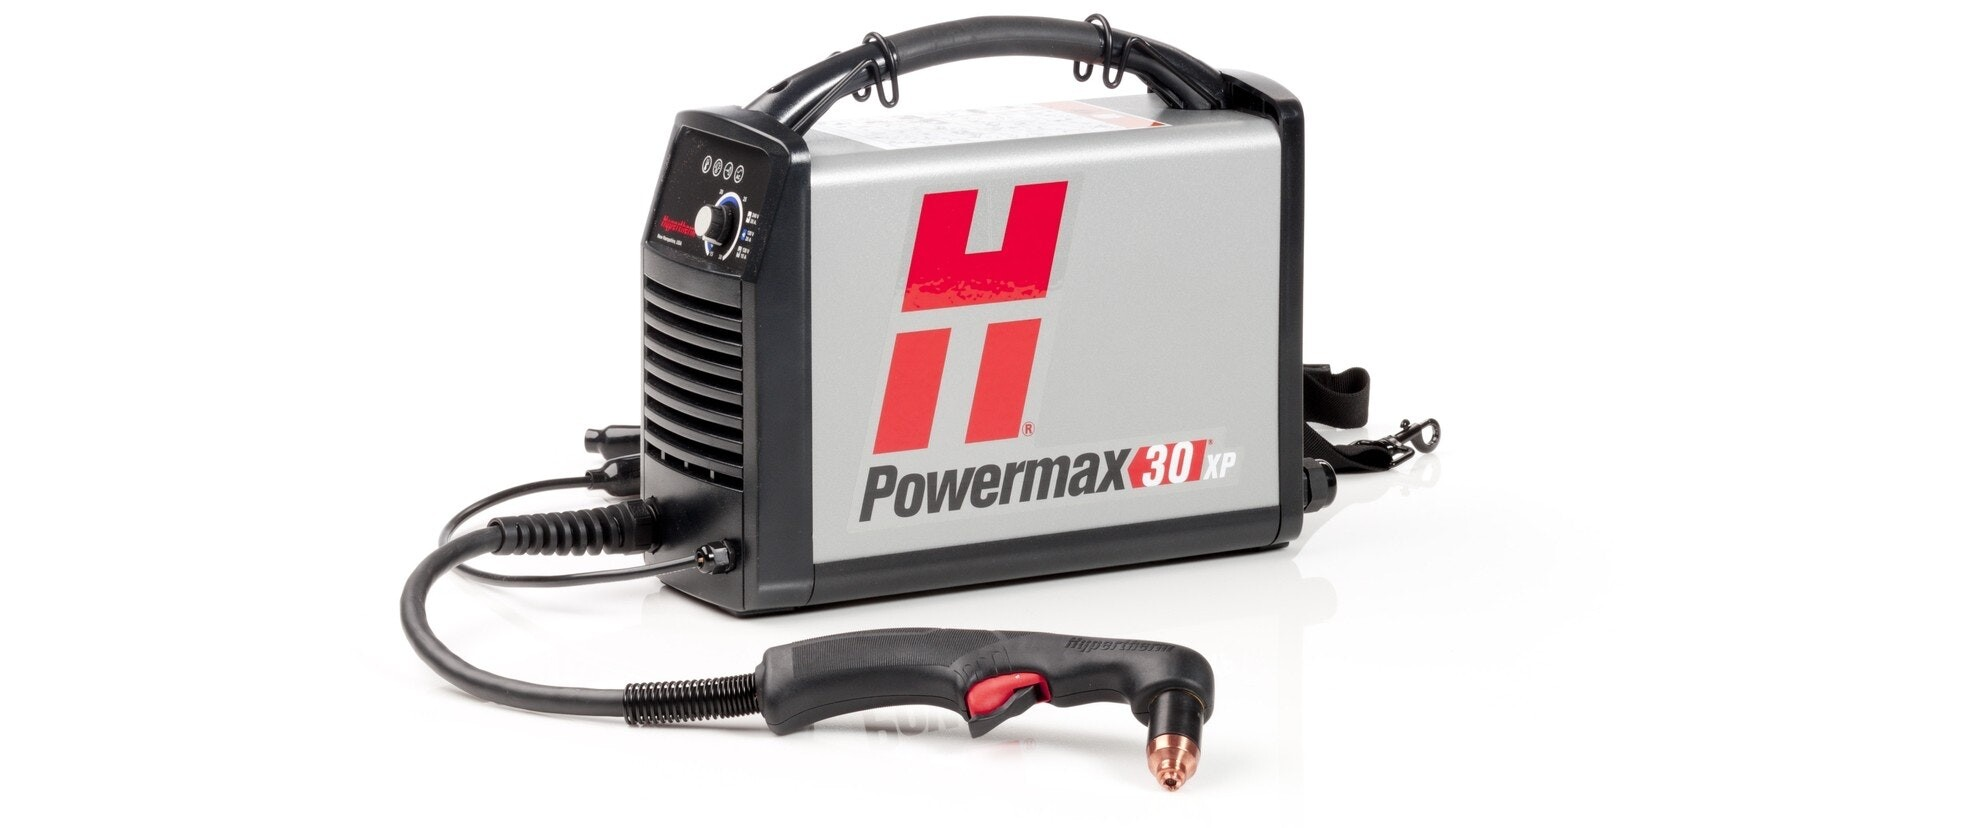 Powermax 30 Air Plasma Cutter